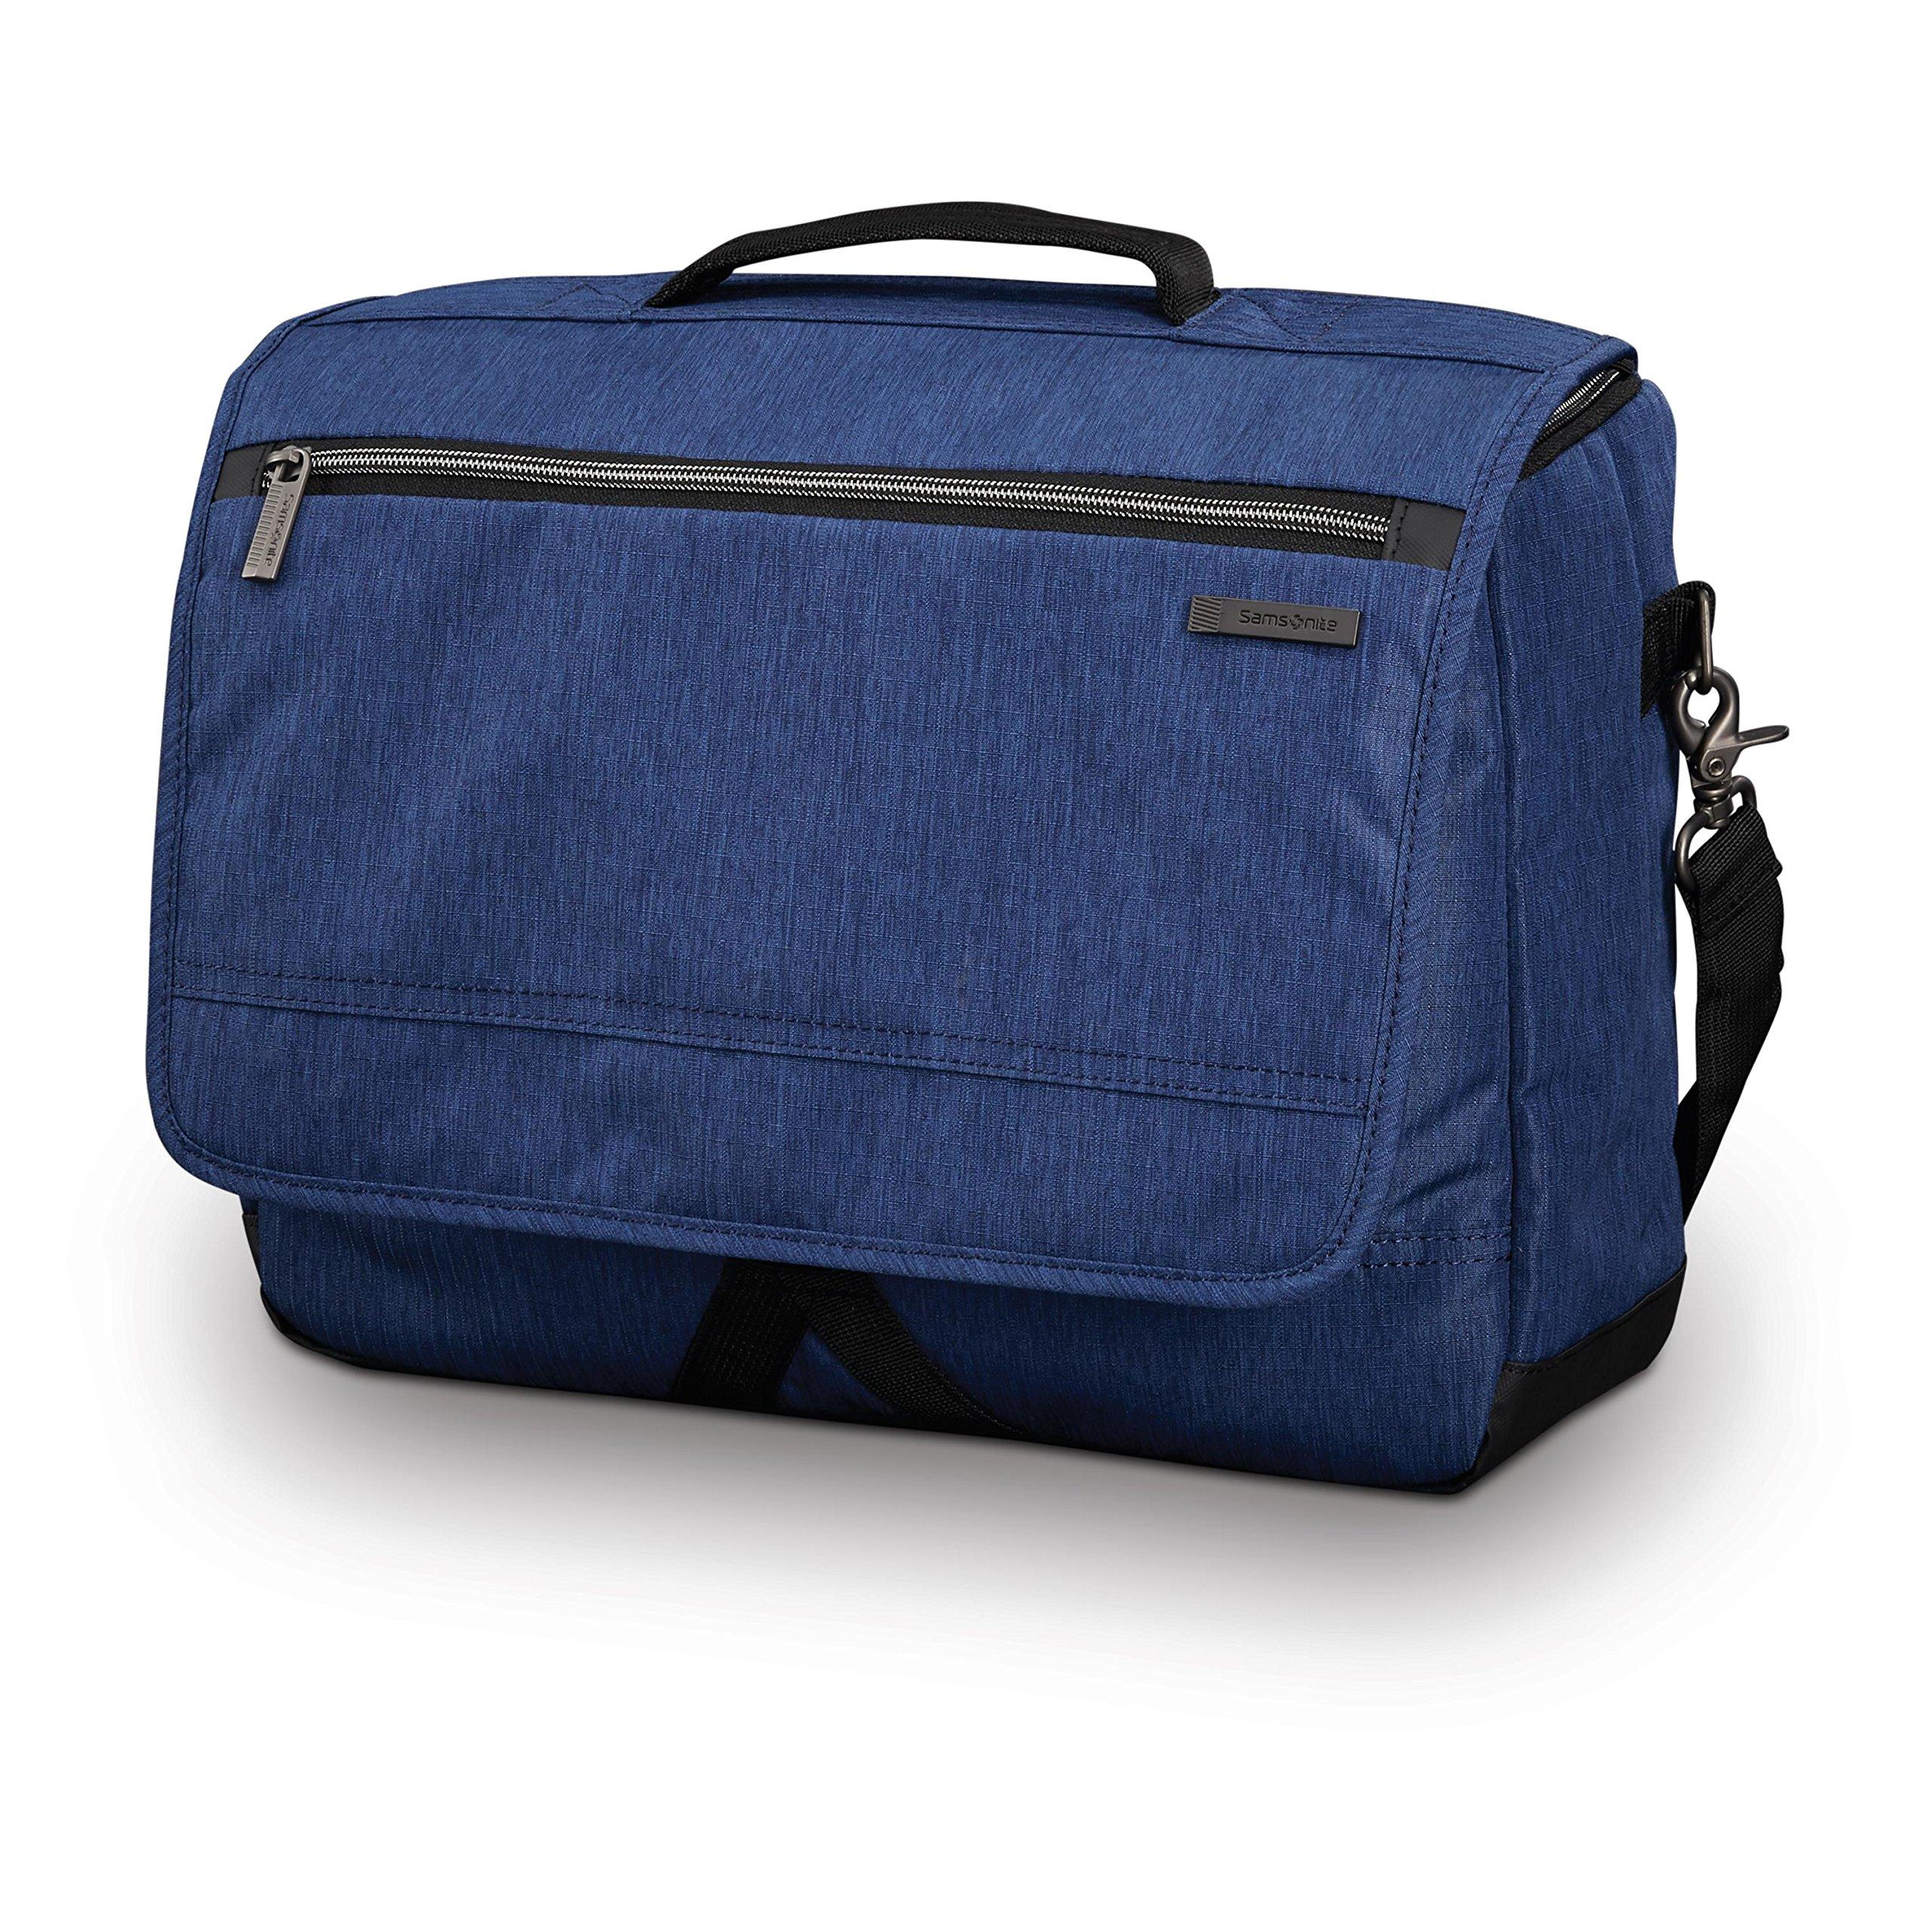 Samsonite Modern Utility Messenger Bag Laptop, True